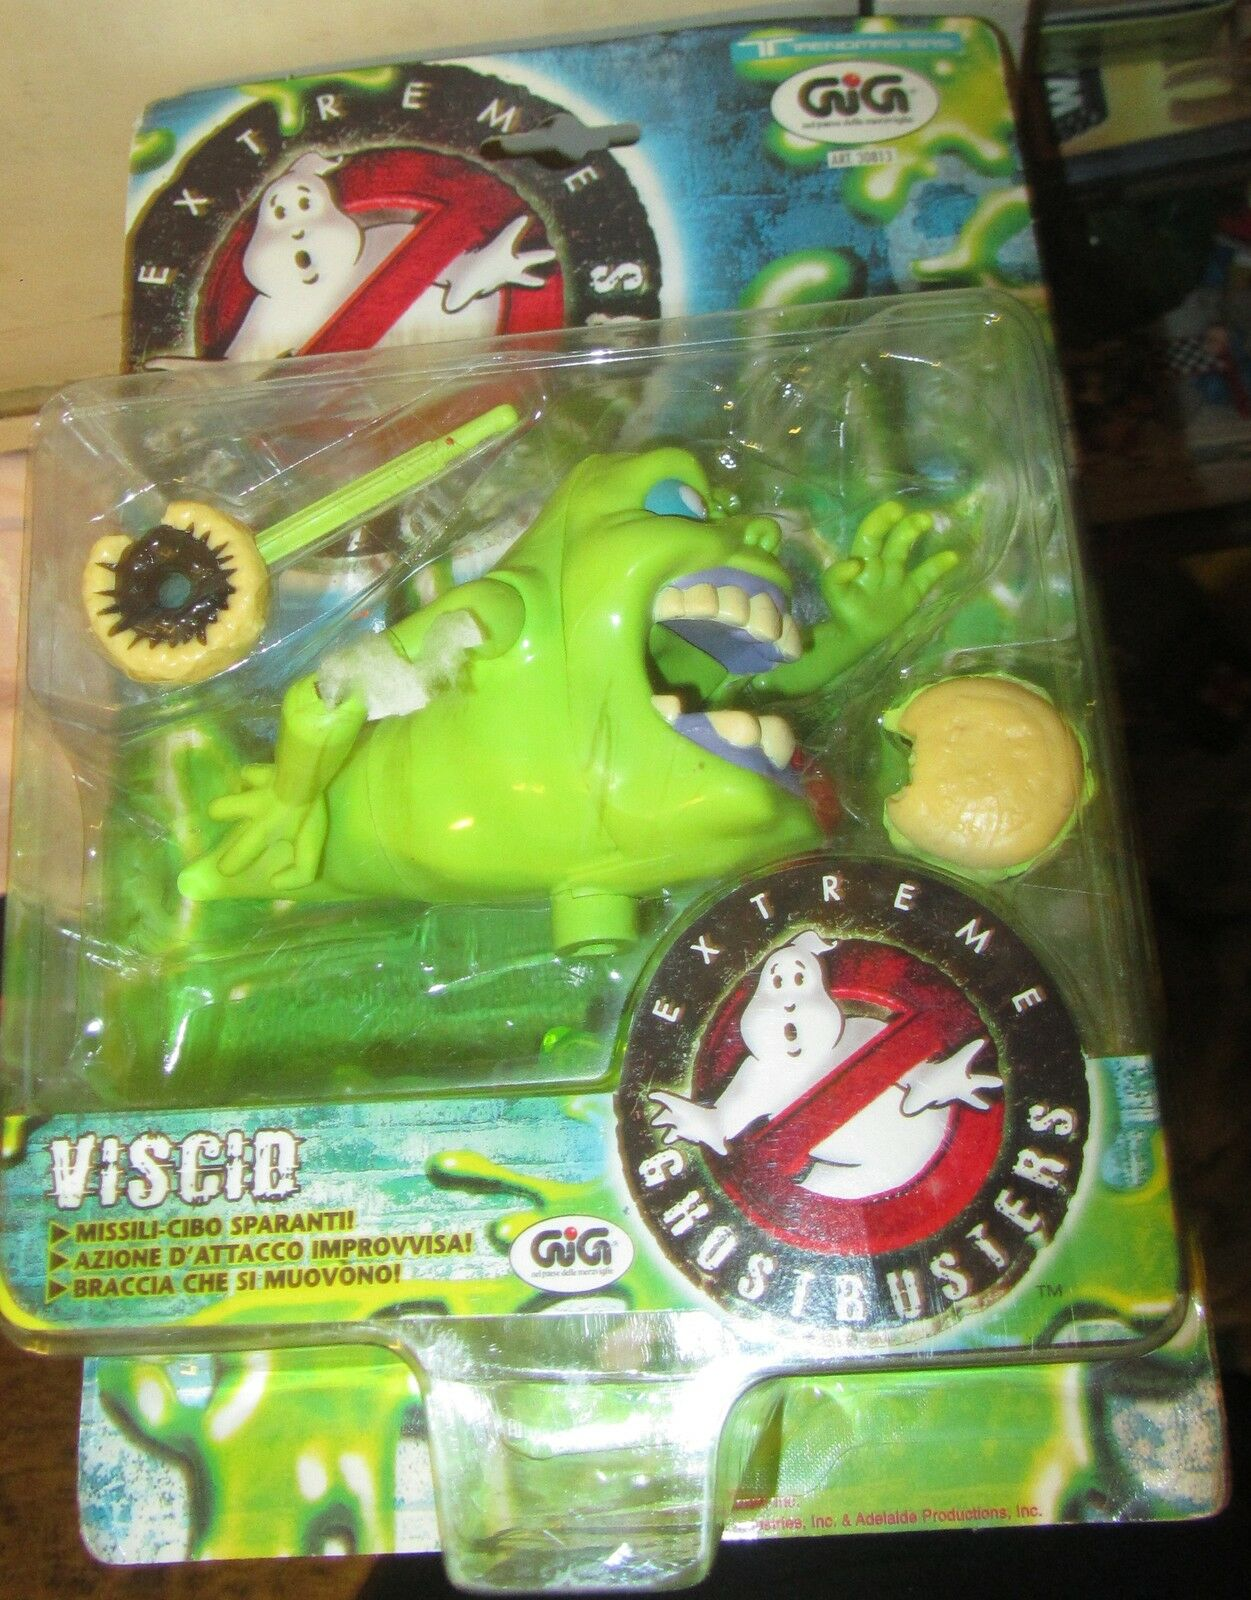 Extreme Ghostbusters Viscid Slimer GIG SPESE GRATIS FONDO DI MAGAZZINO